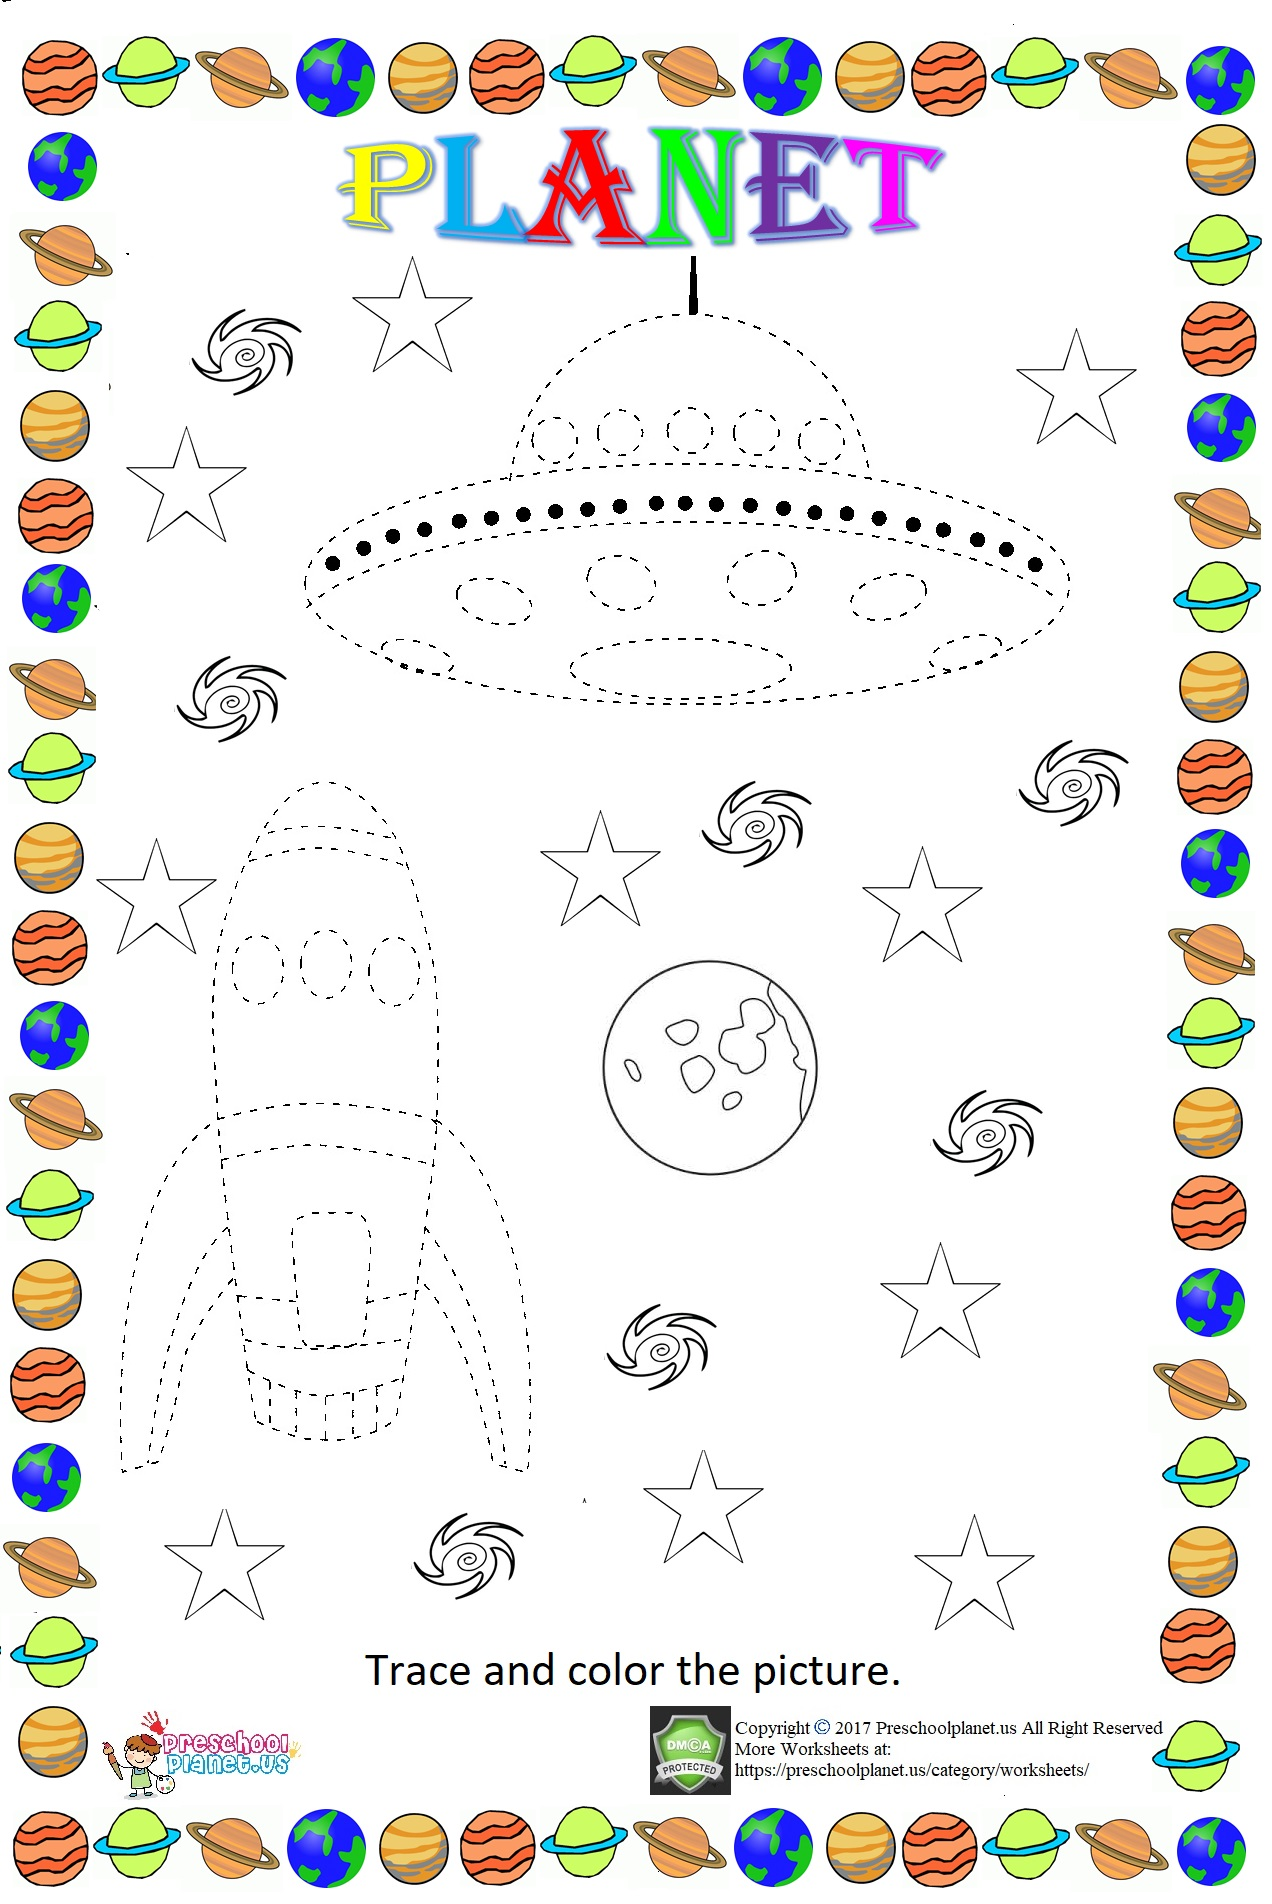 Clock Trace Line Worksheet Preschoolplanet